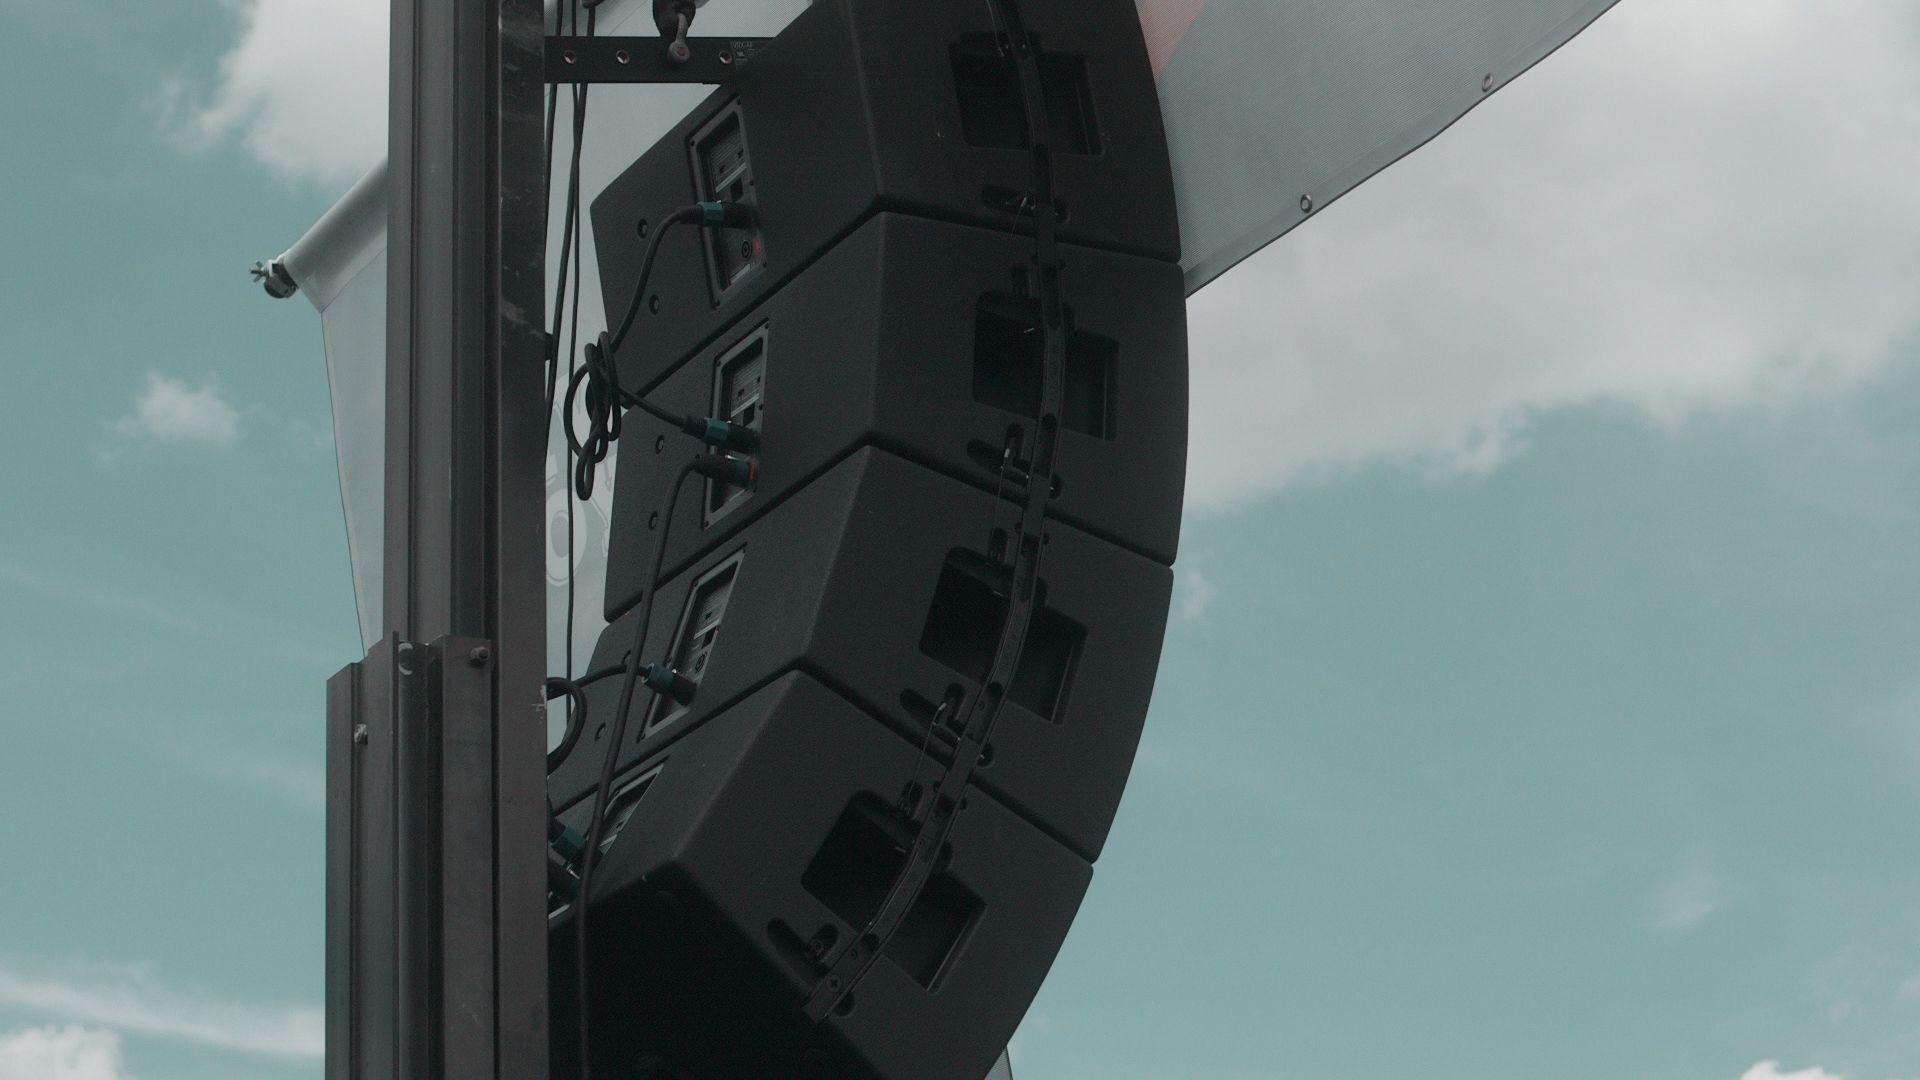 stl speaker rental